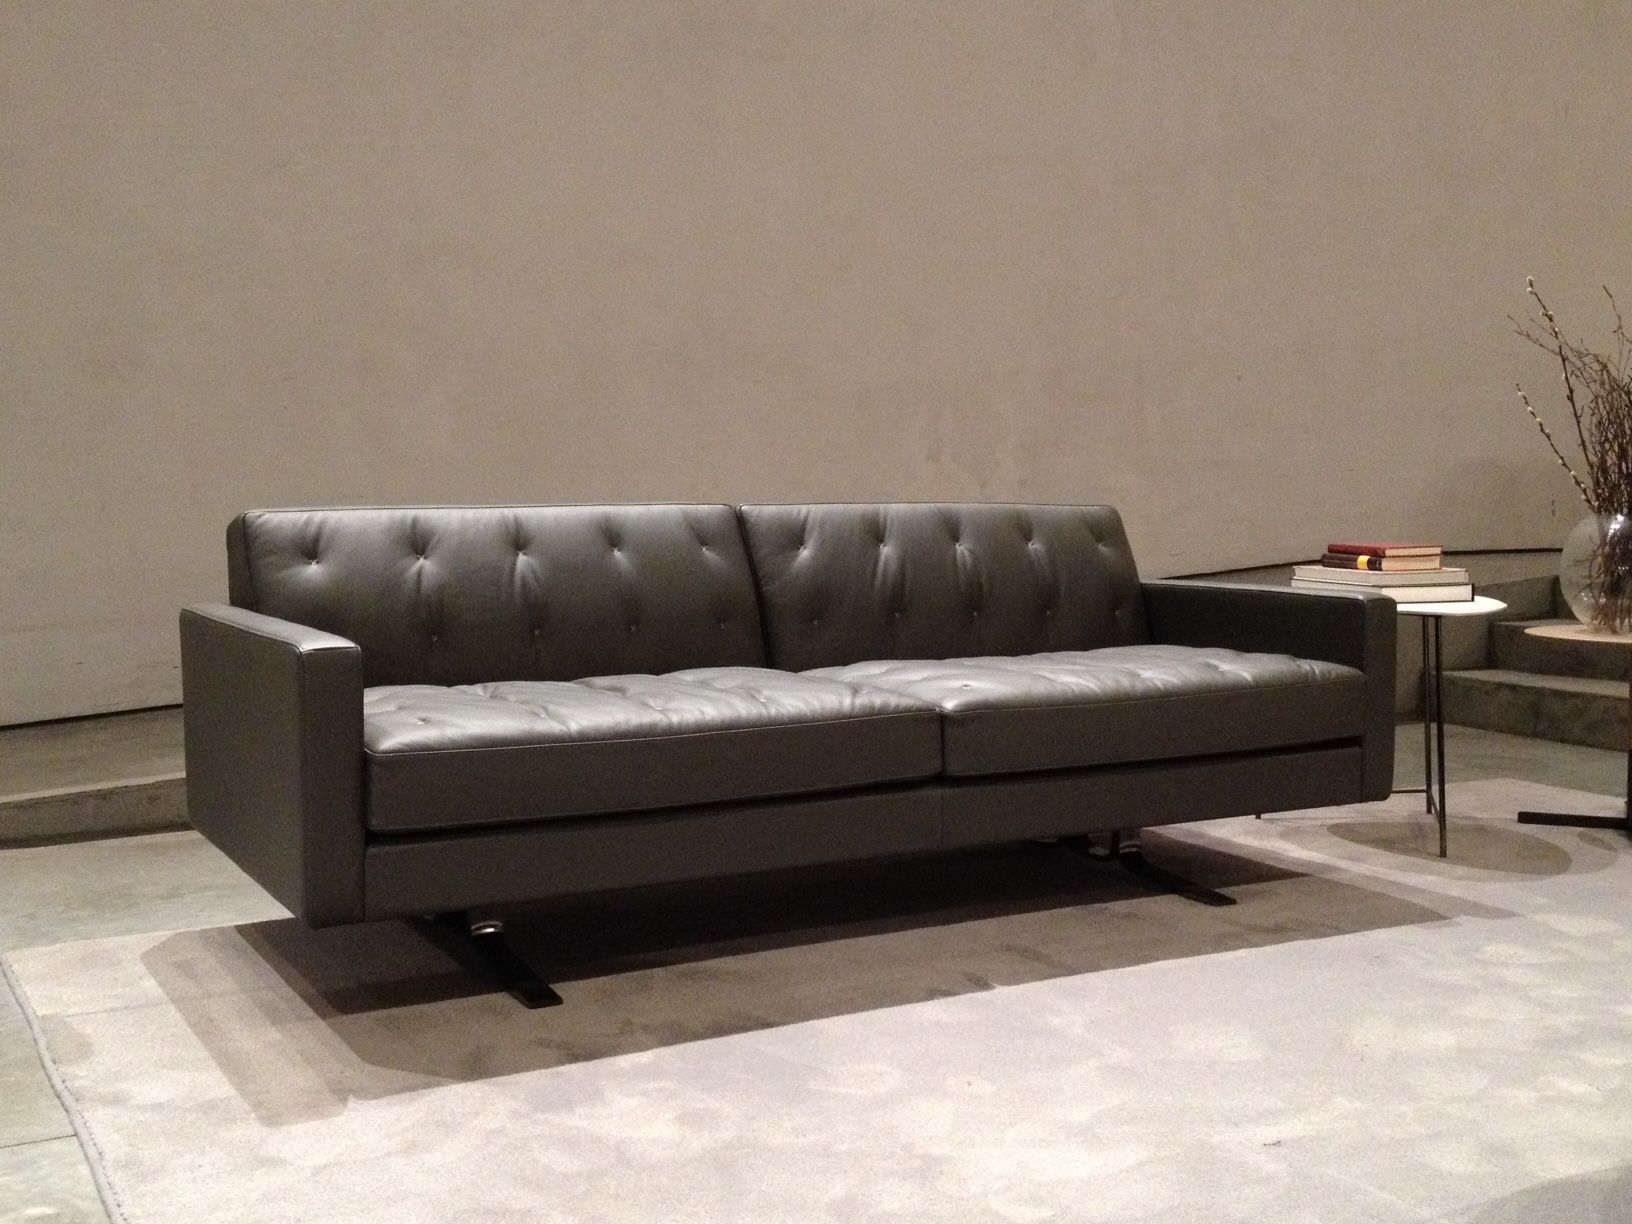 poltrona frau sofa kennedee how to make a sleeper comfortable maud s by